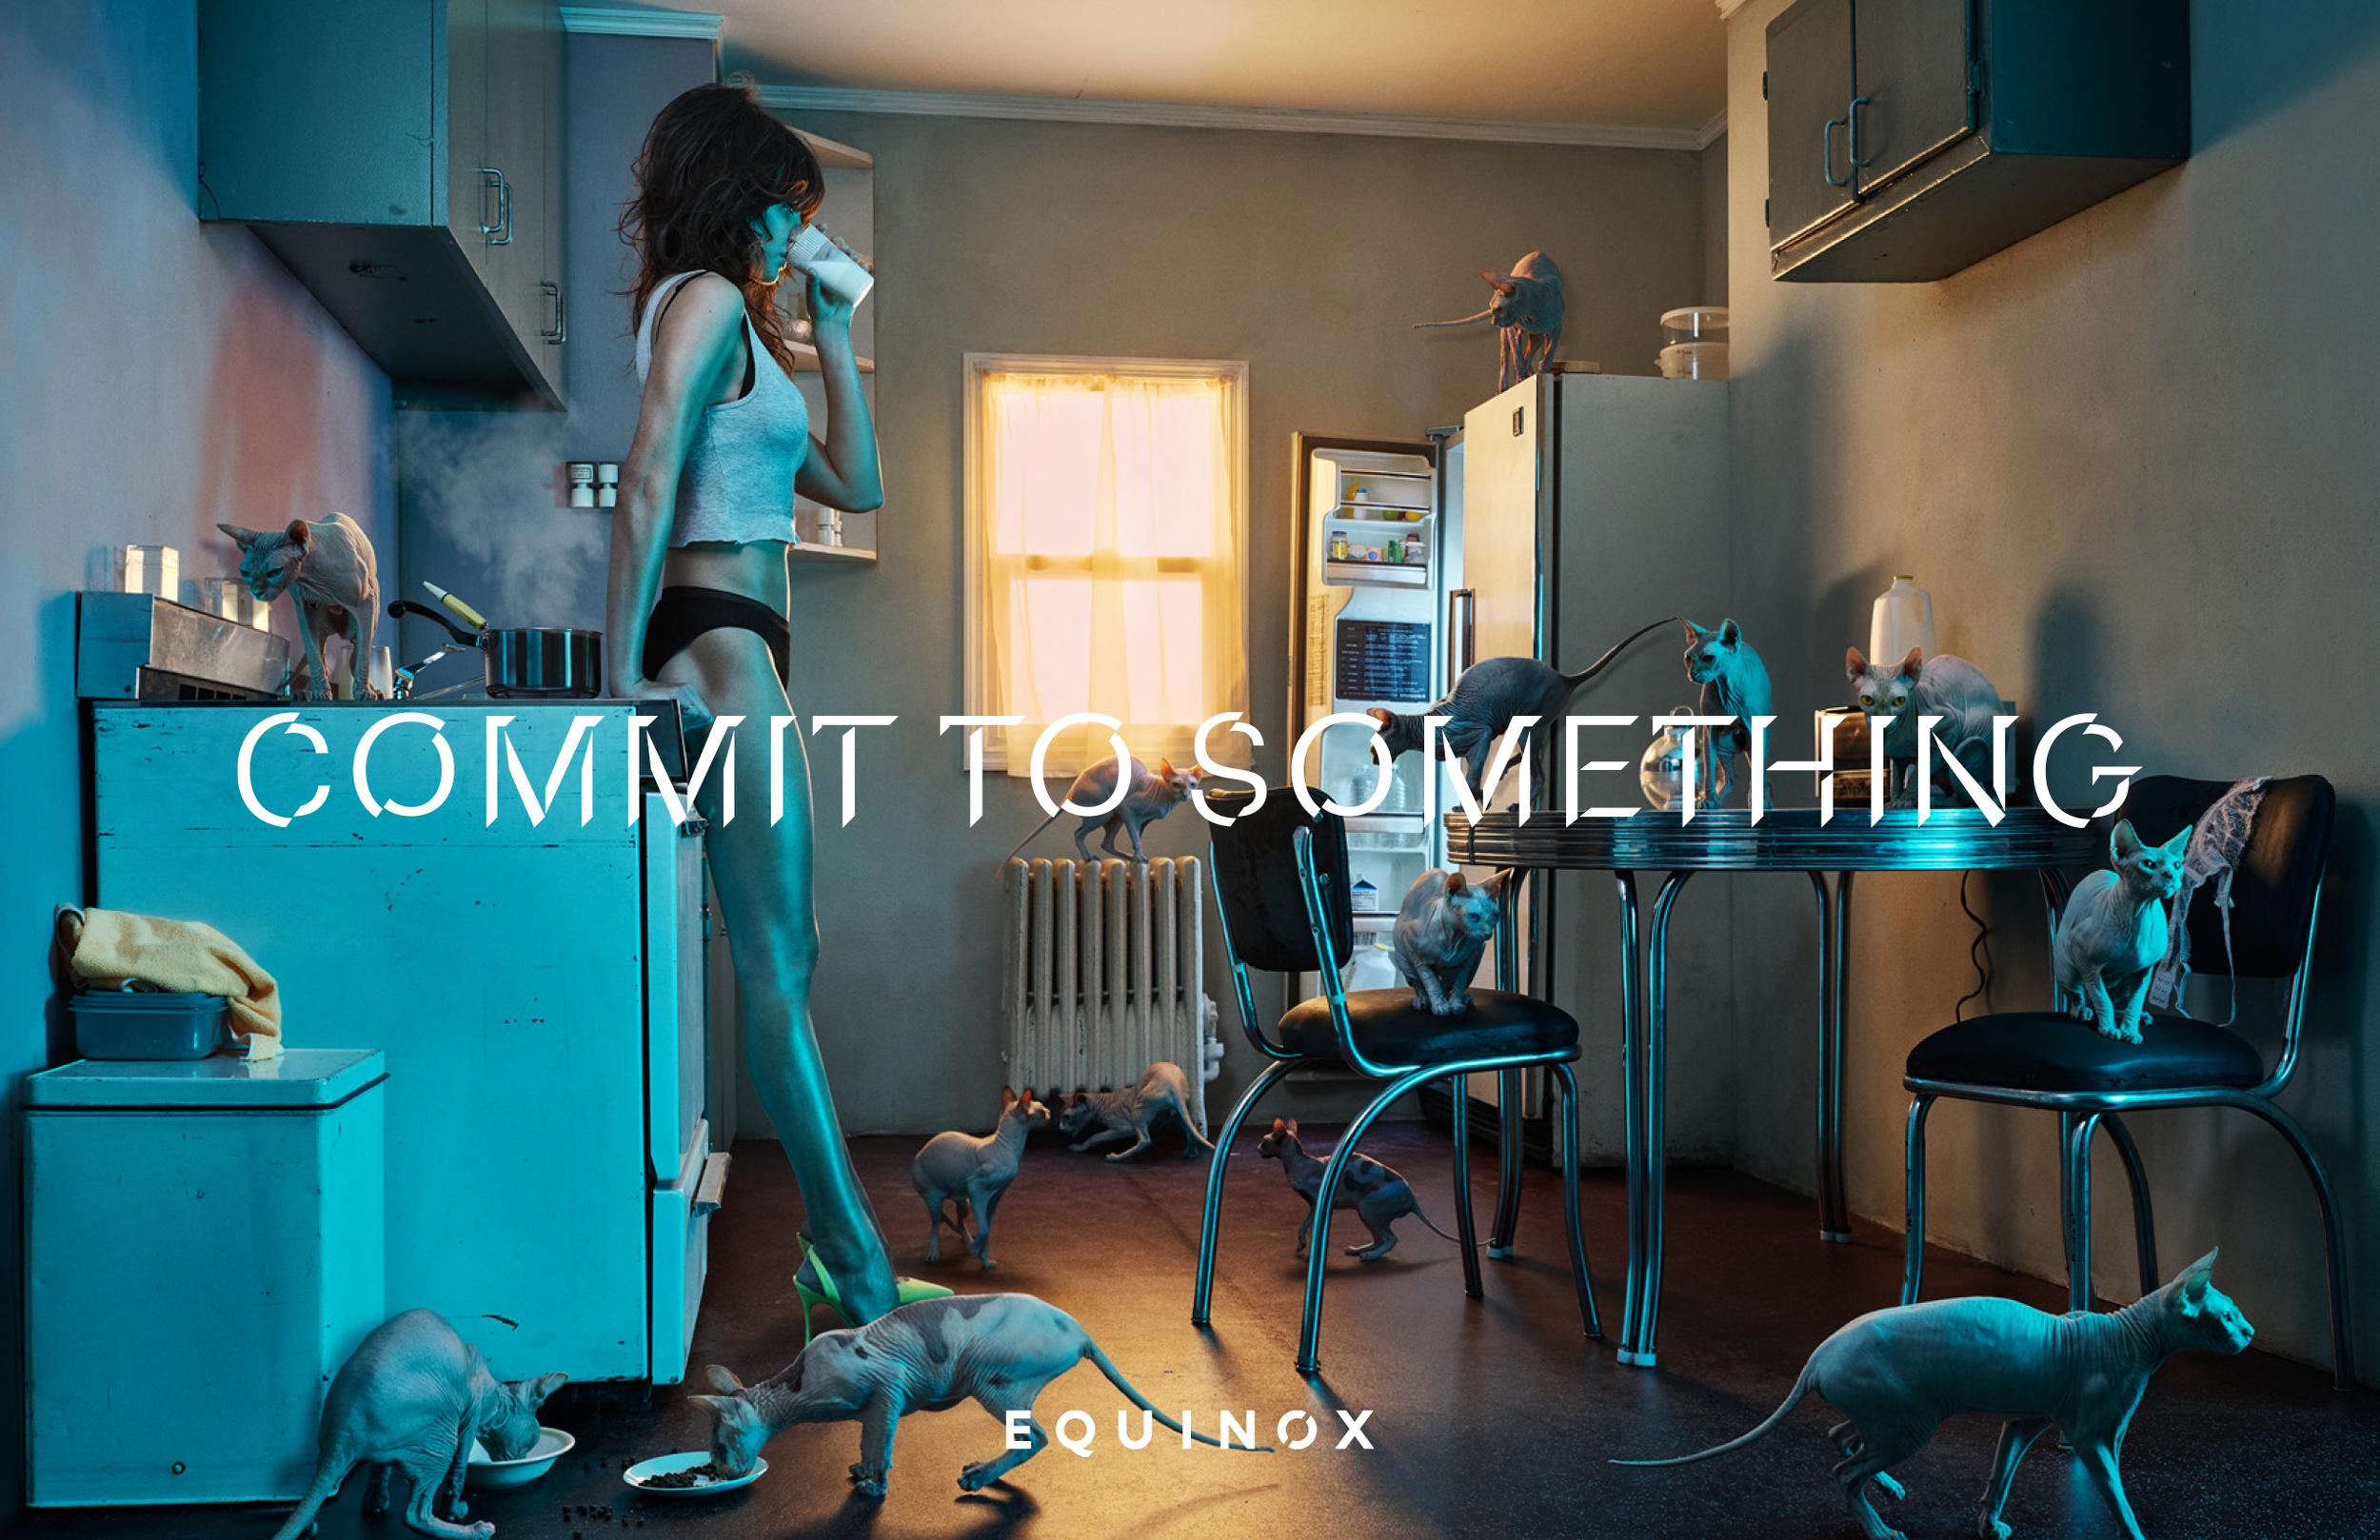 CommitToSomething4.jpg